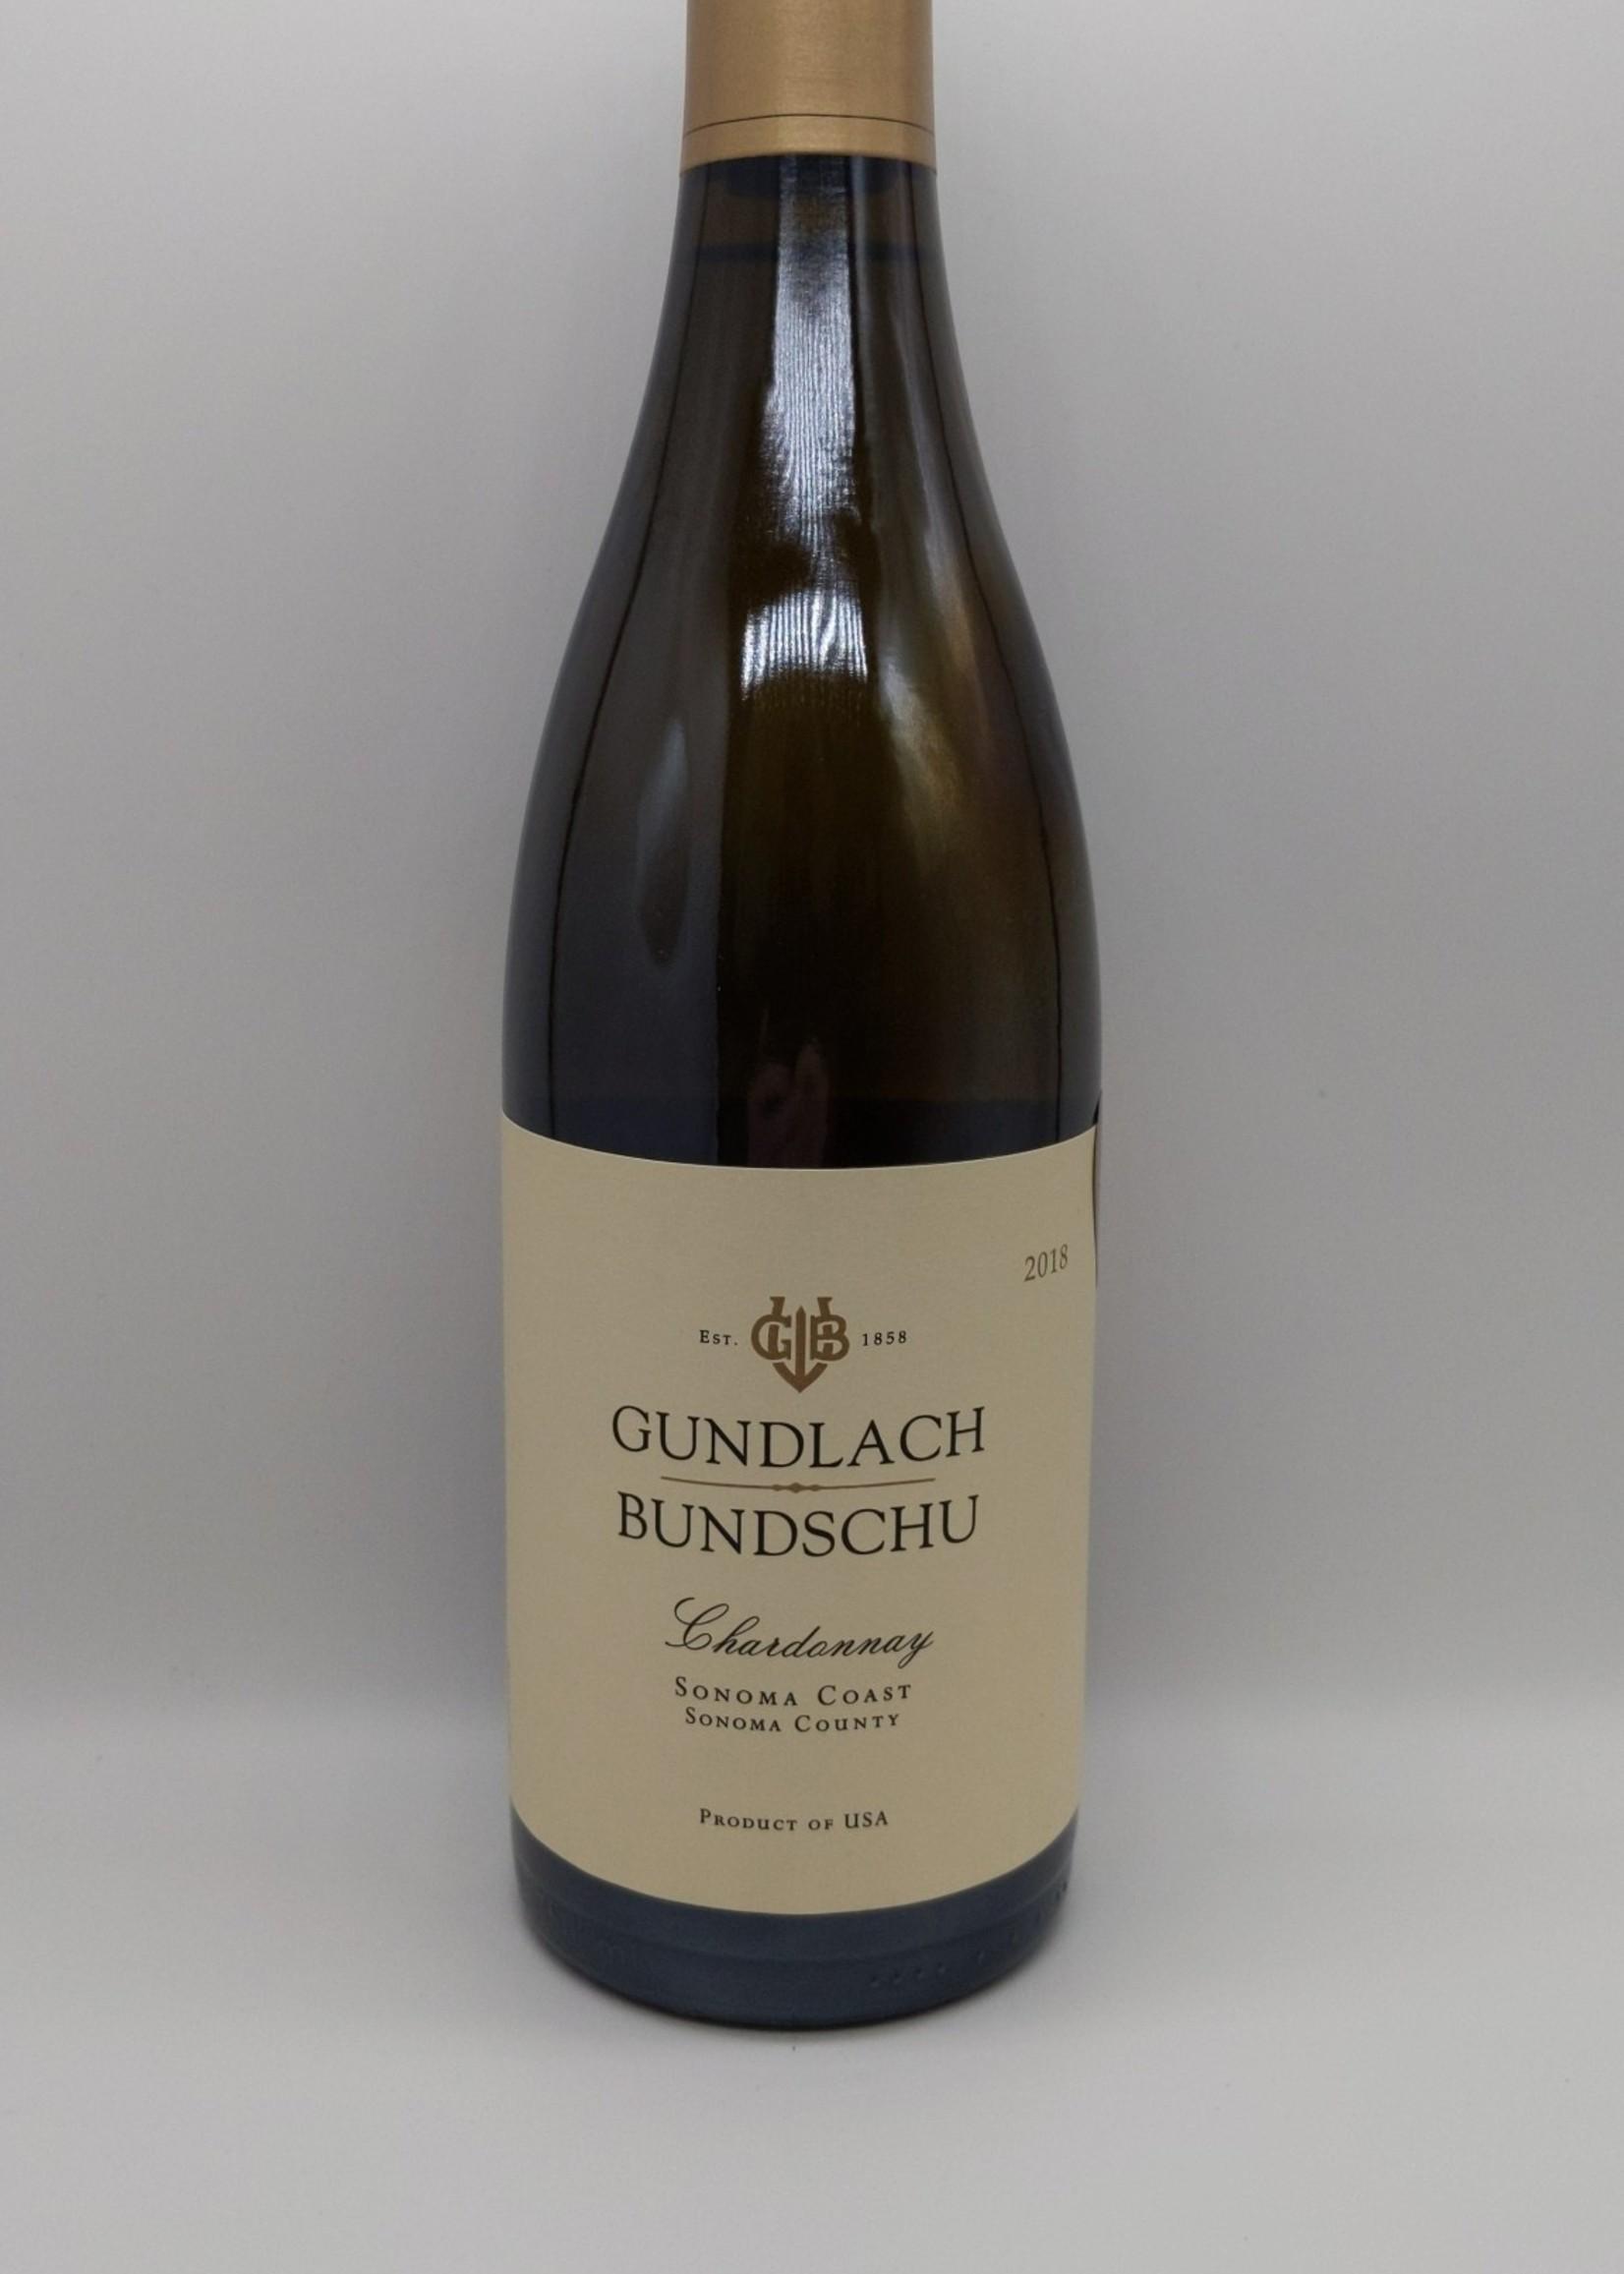 2018 GUNLACH BUNDSCHU CHARDONNAY 750ml